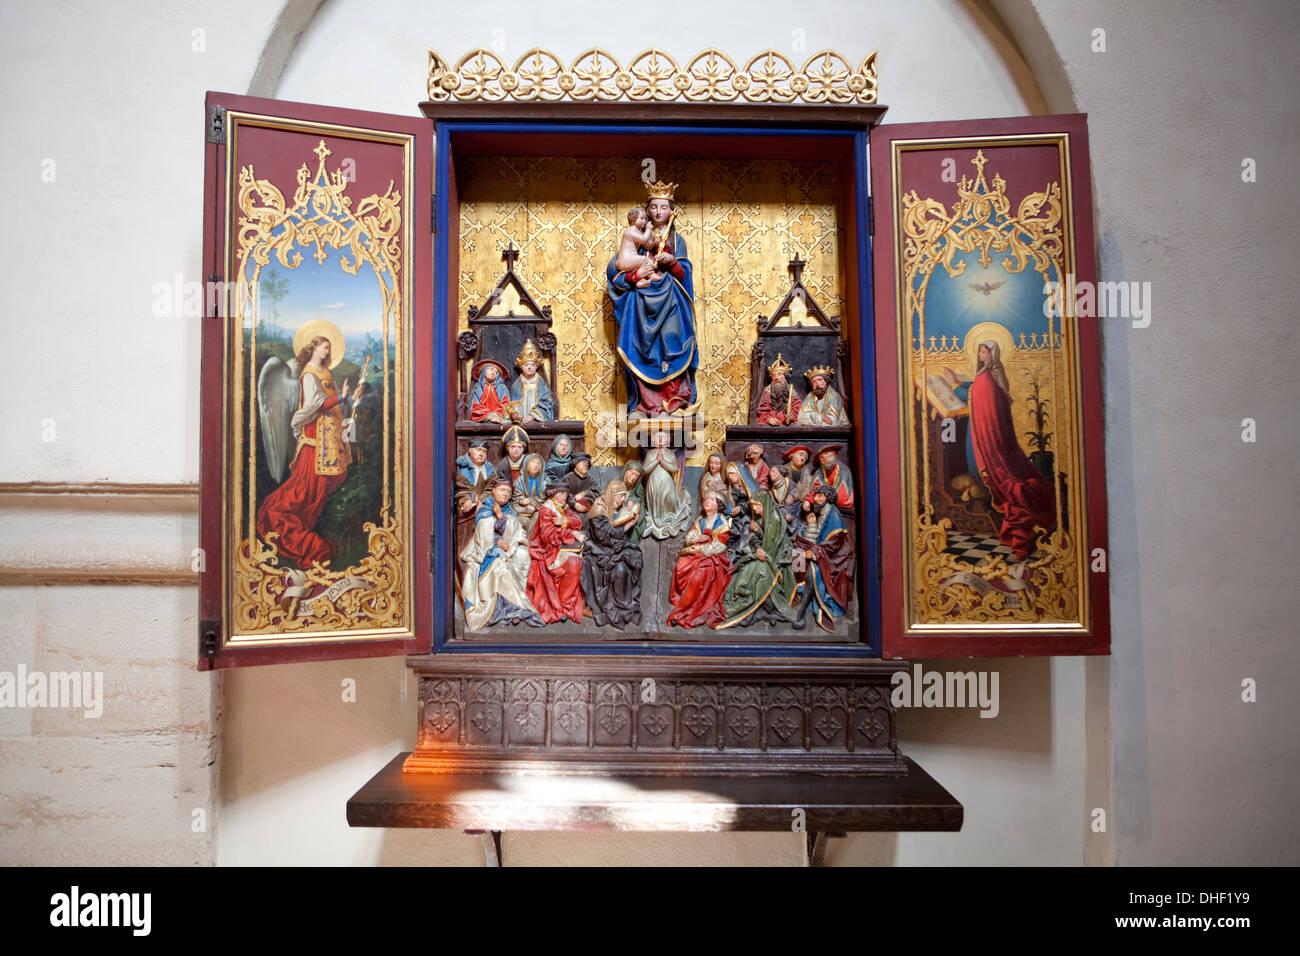 Altar of the Virgin Mary, c. 1500, Cistercian monastery Loccum, Lower Saxony, Germany - Stock Image